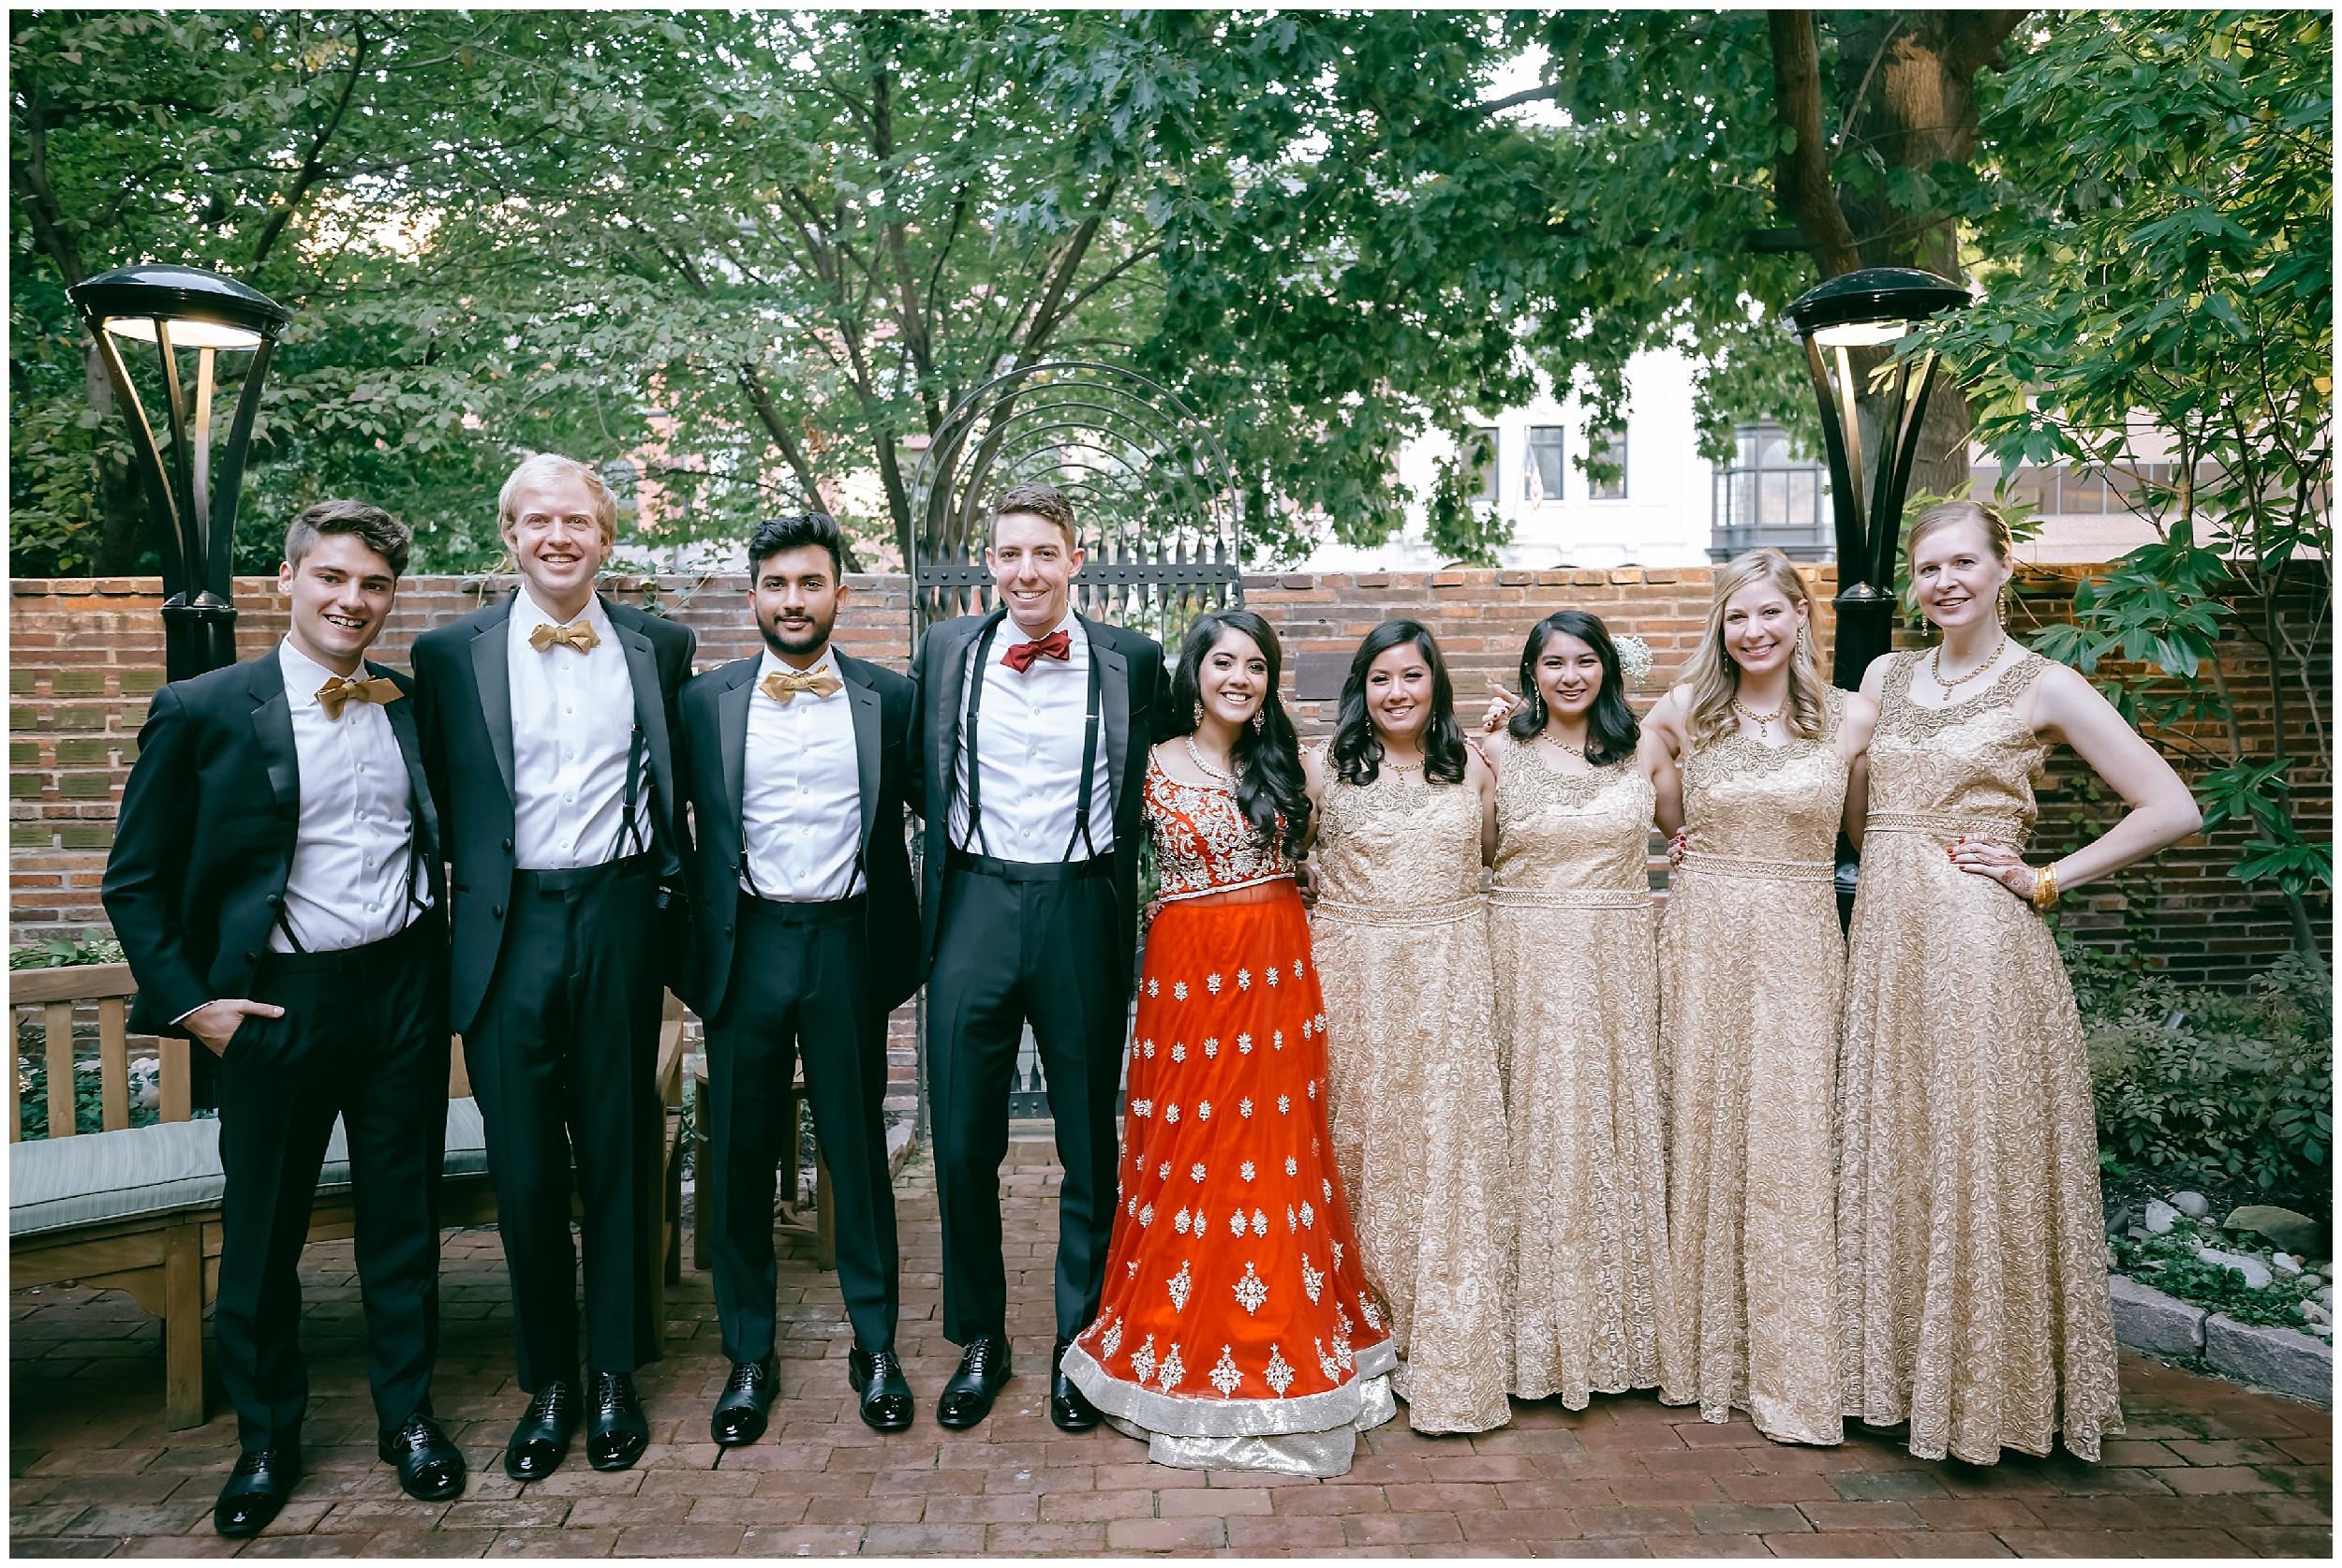 bridal party formals Whittemore House wedding Washington DC